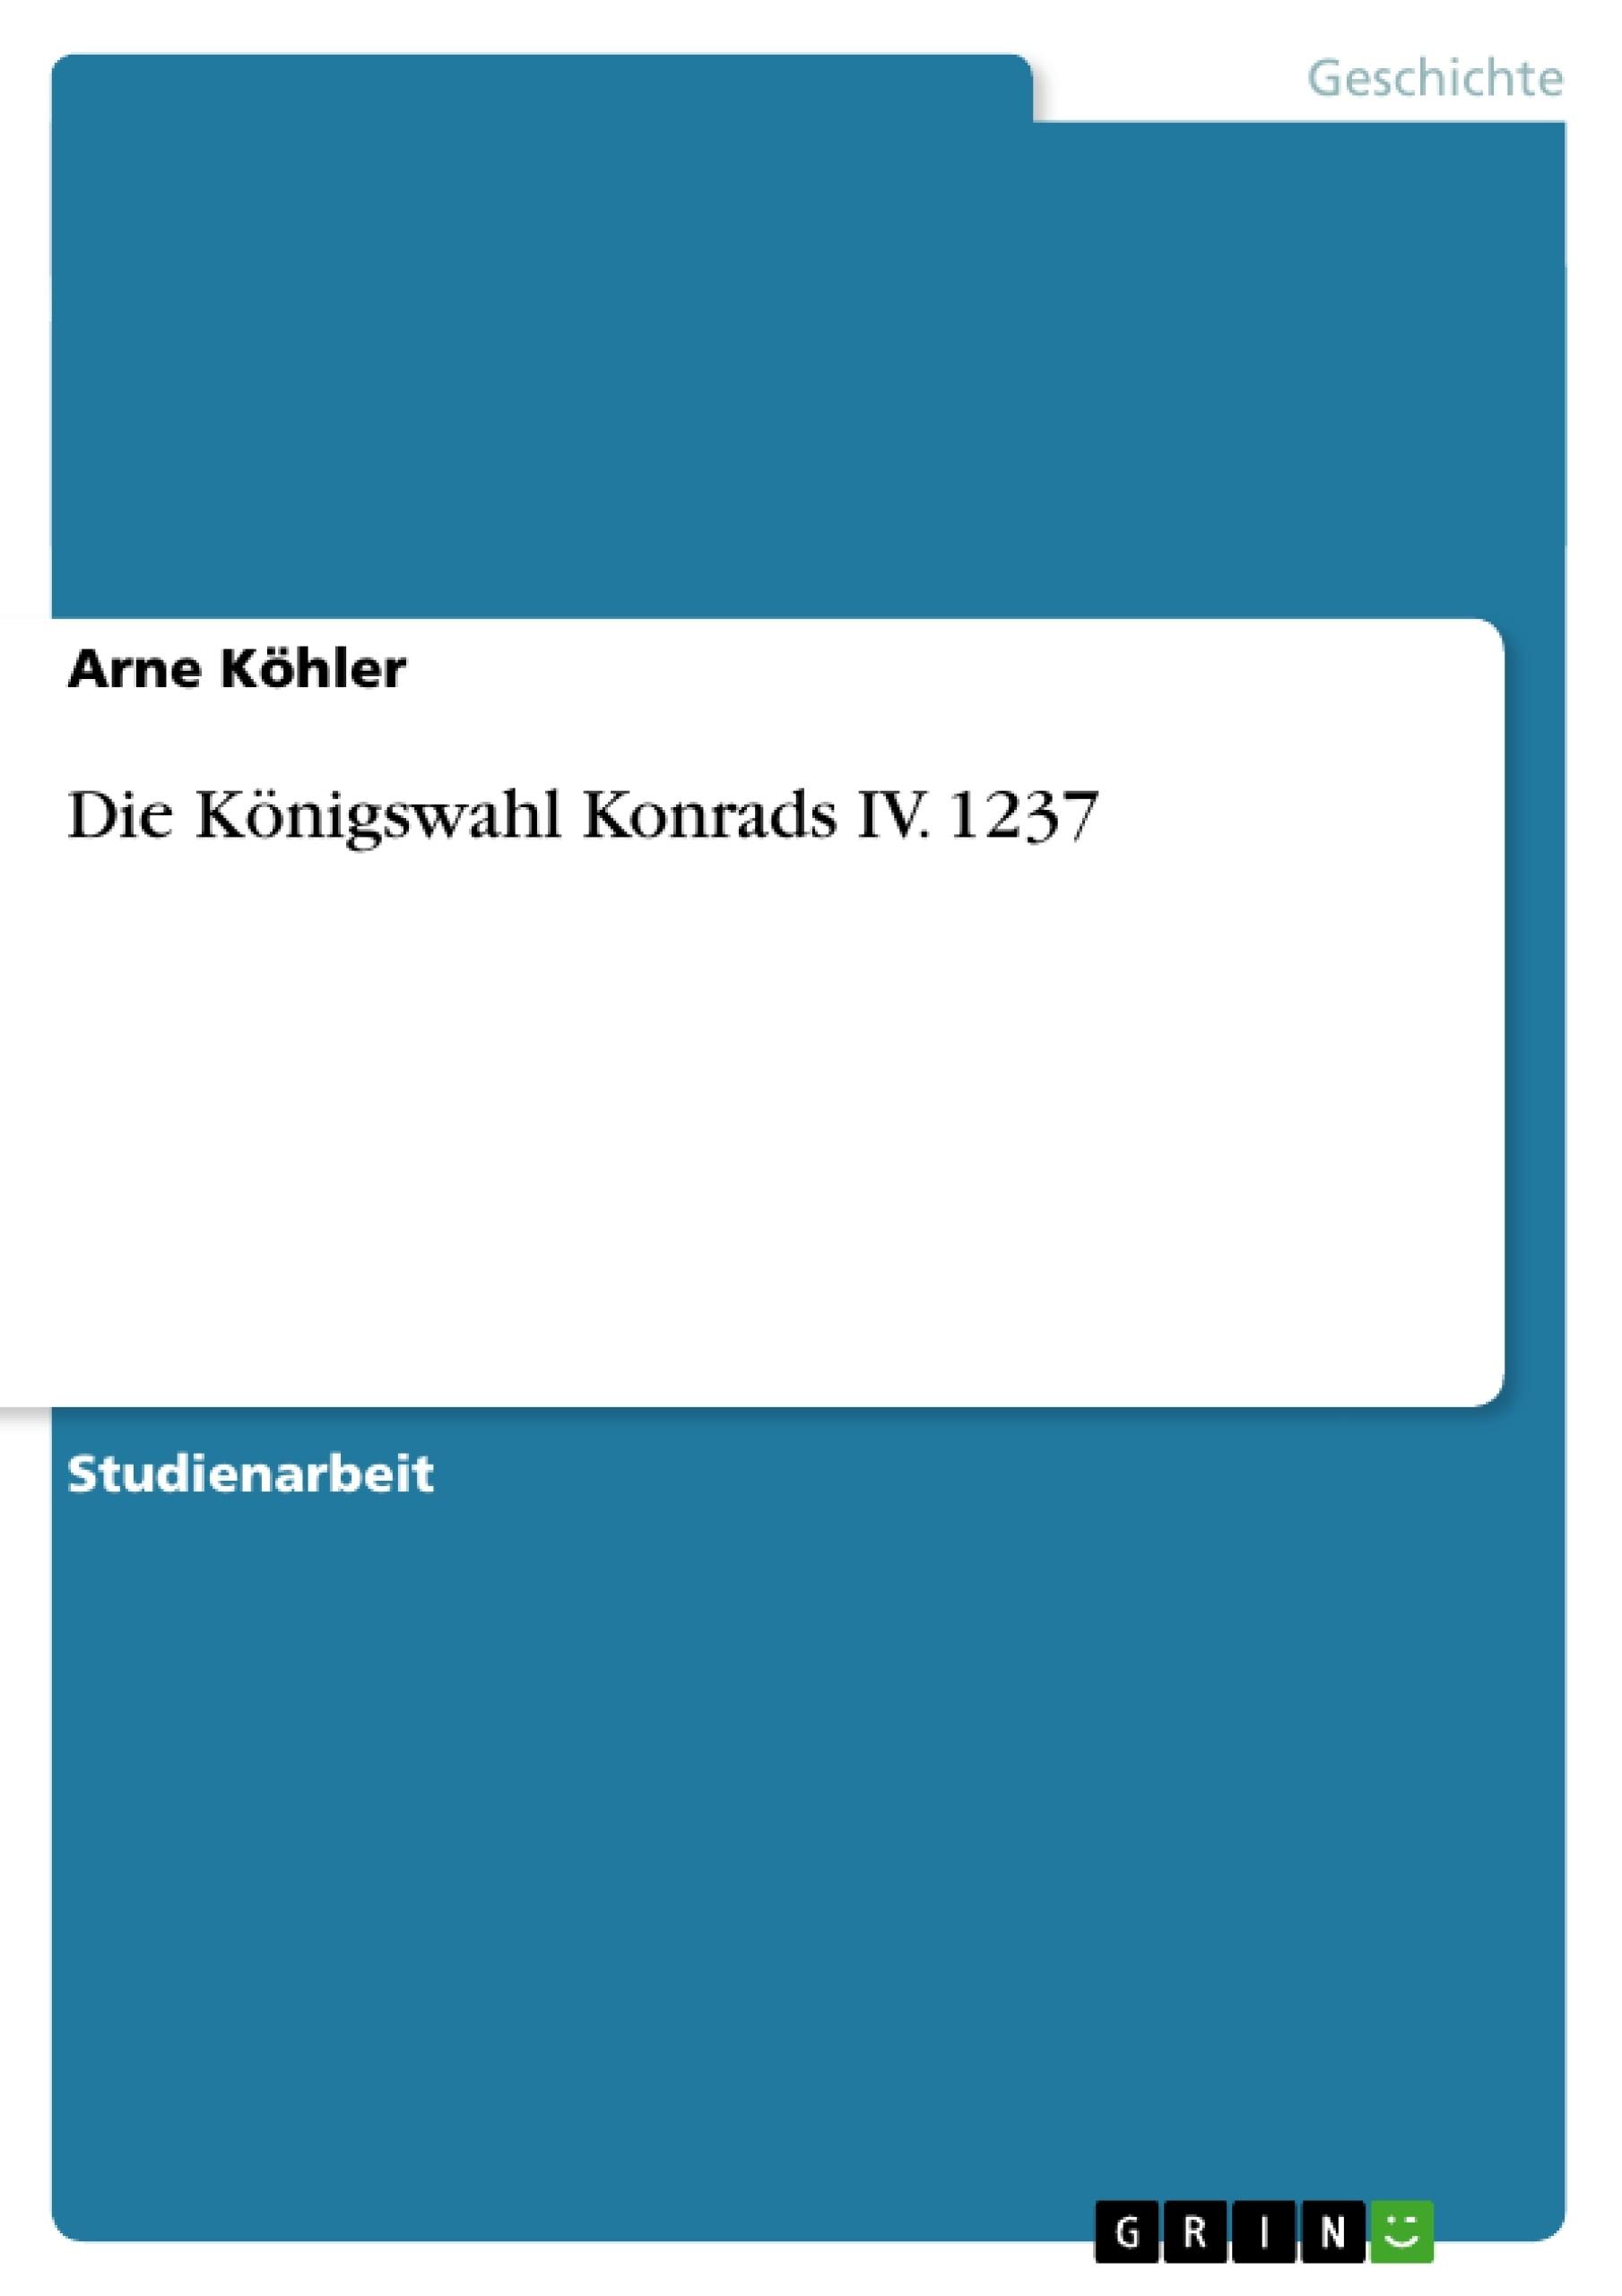 Titel: Die Königswahl Konrads IV. 1237